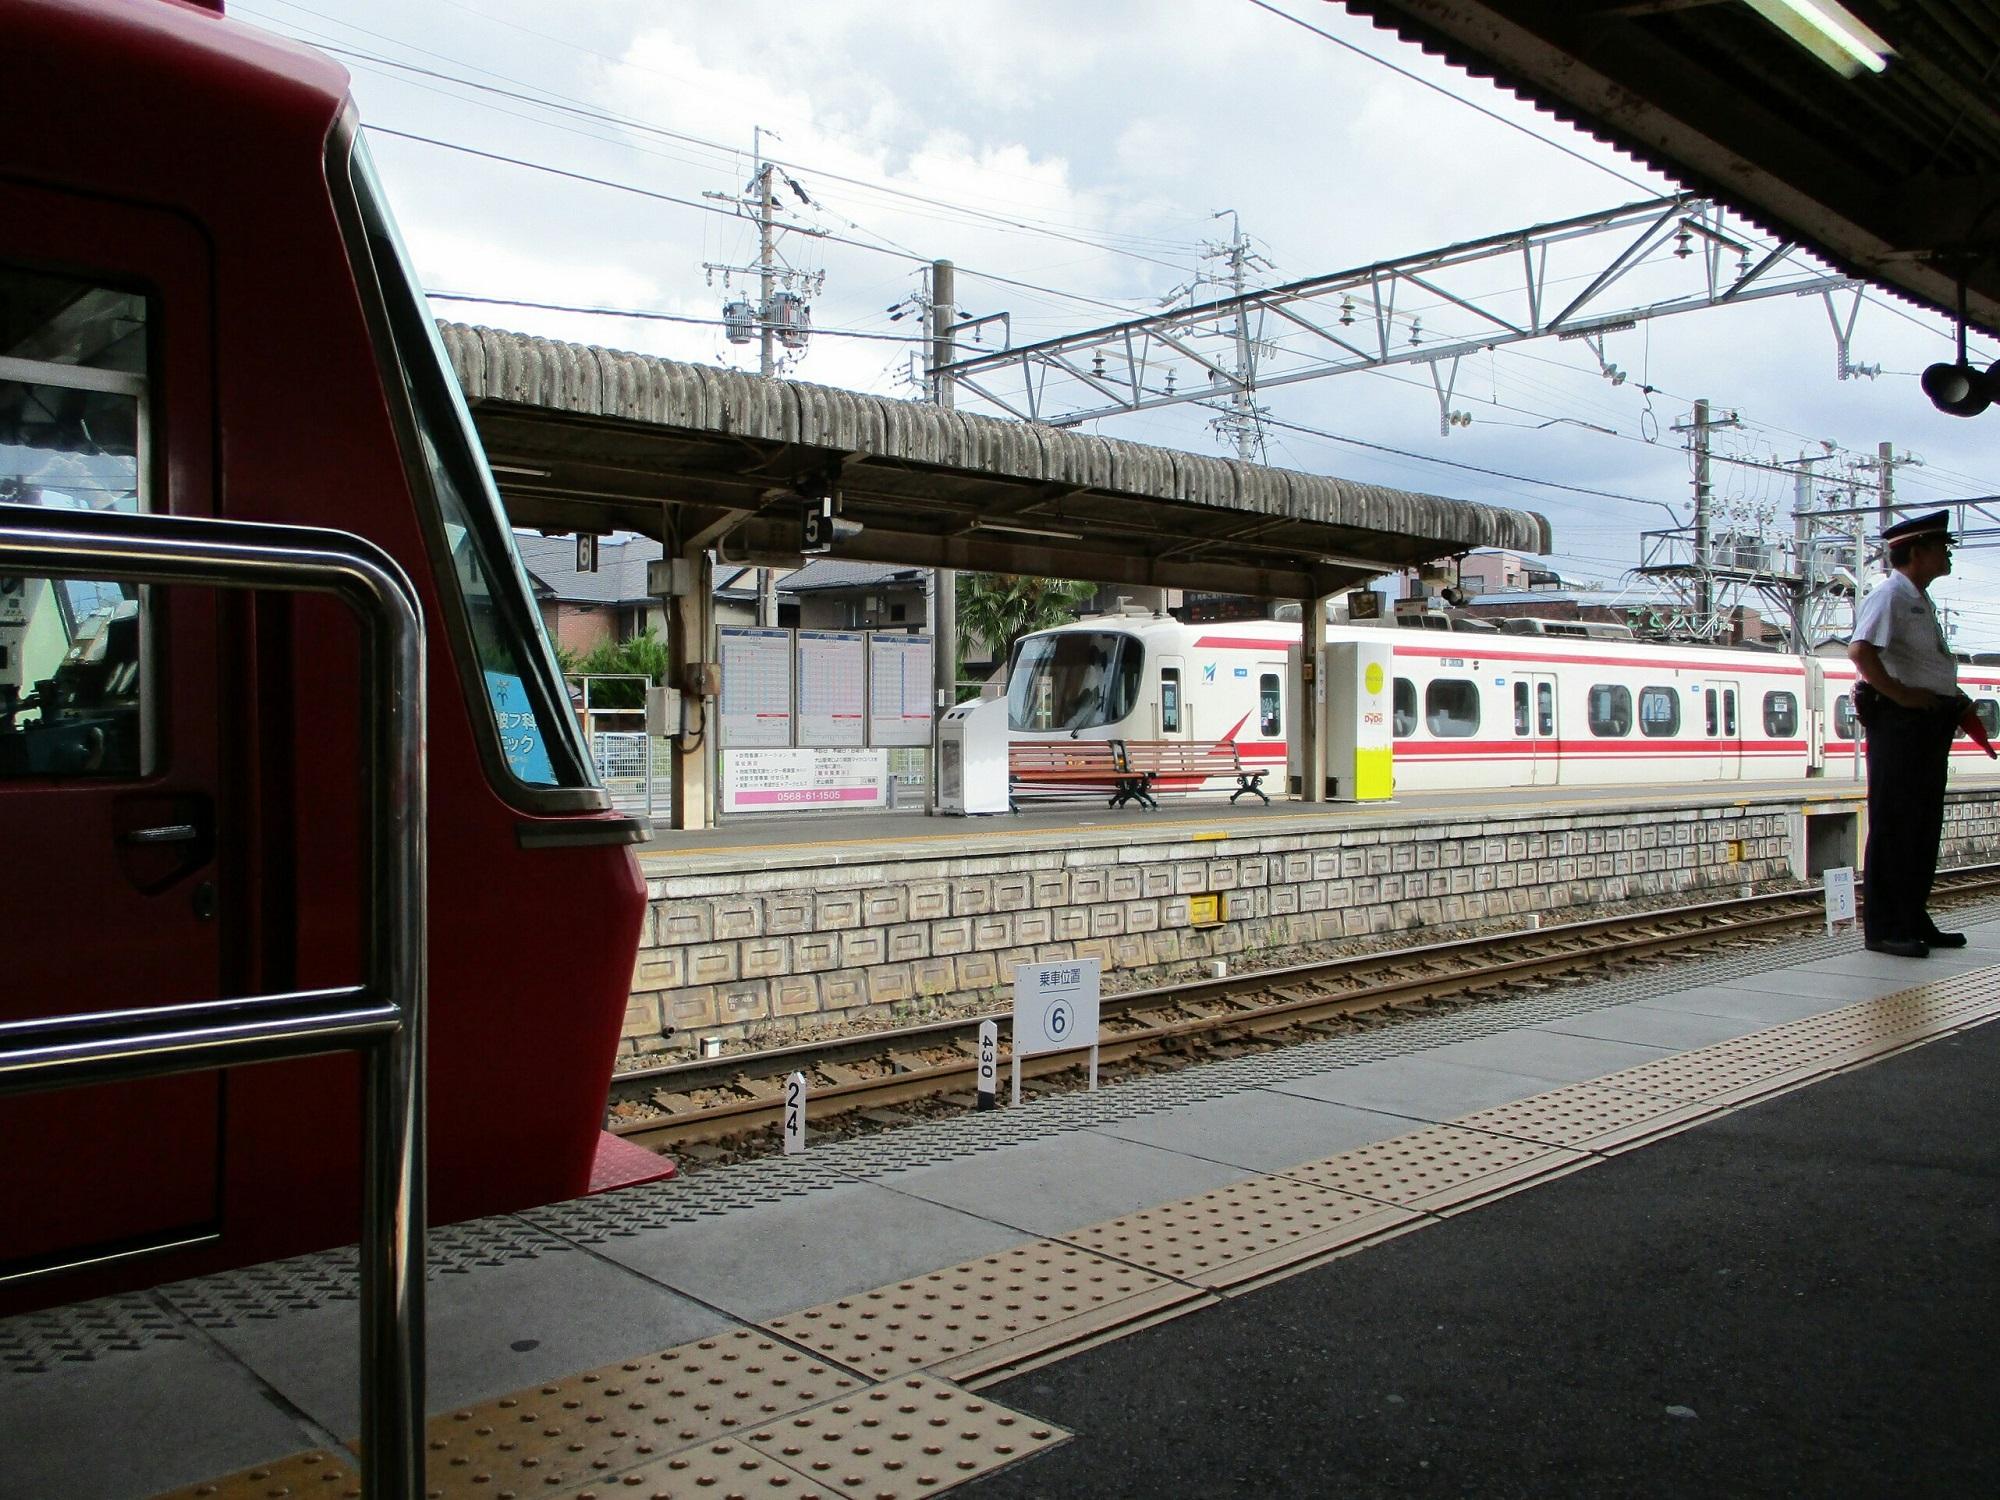 2018.6.30 (22) 犬山 2000-1500